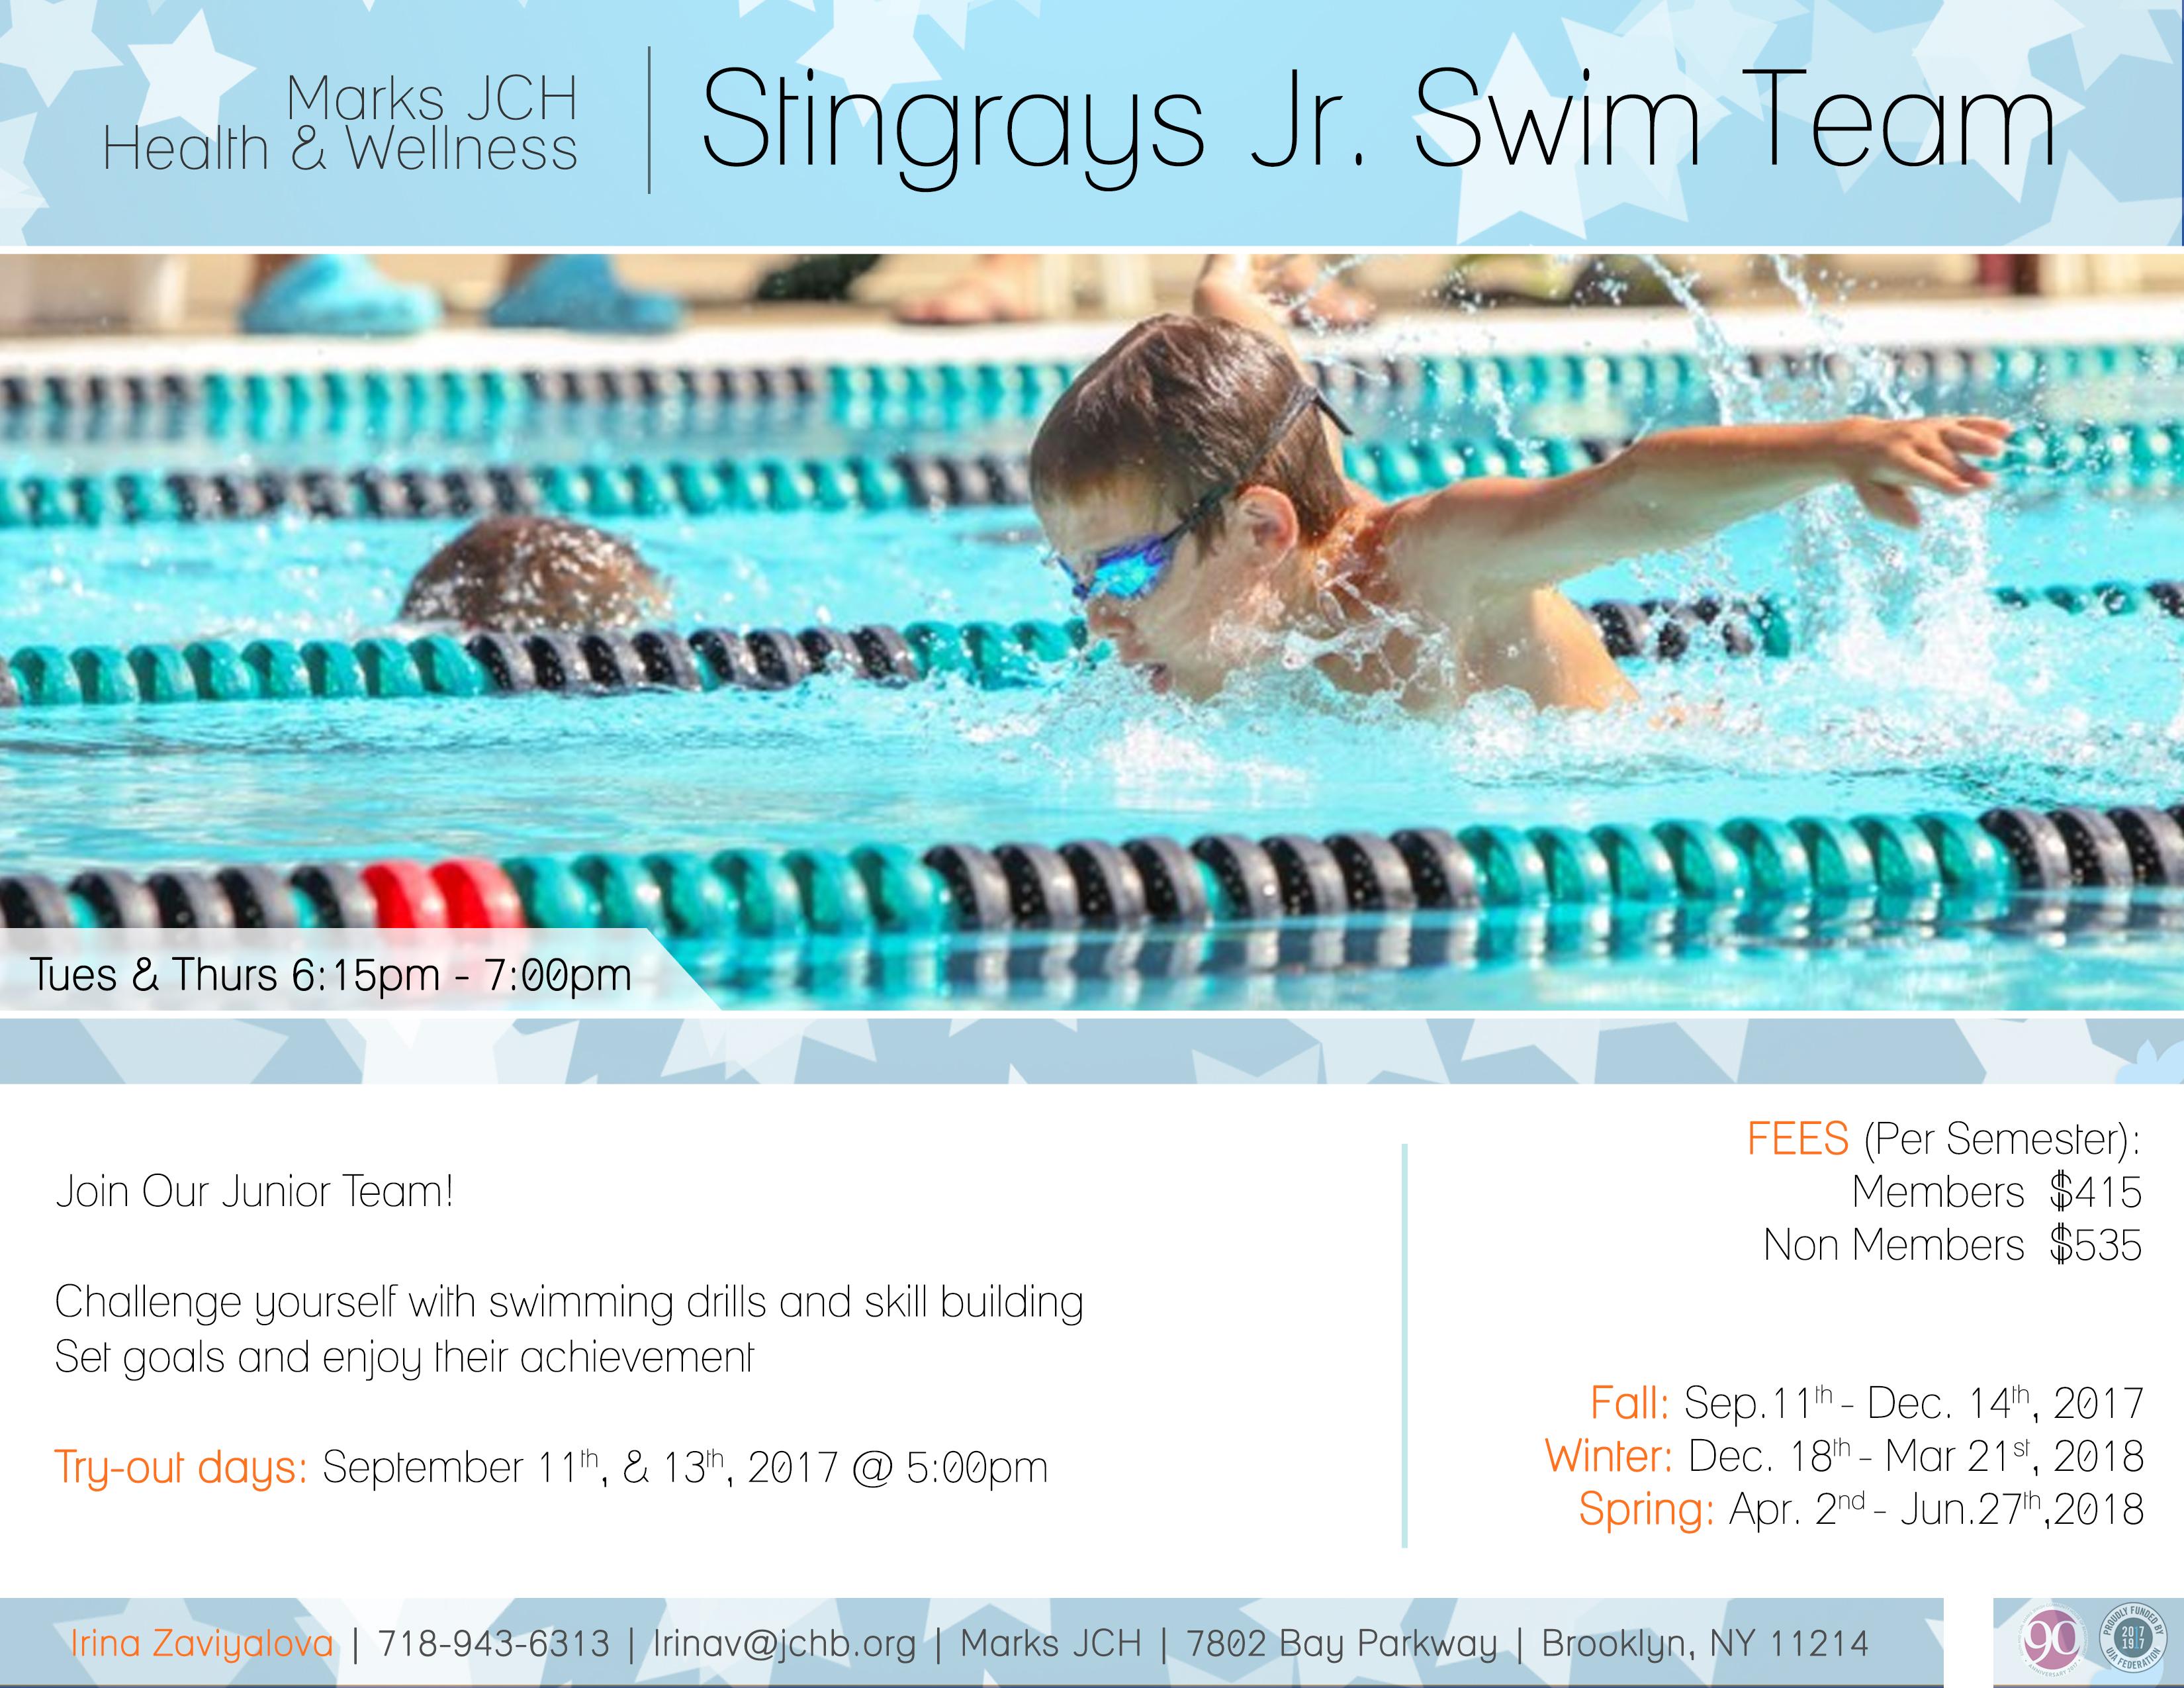 swimteamJRFALL17